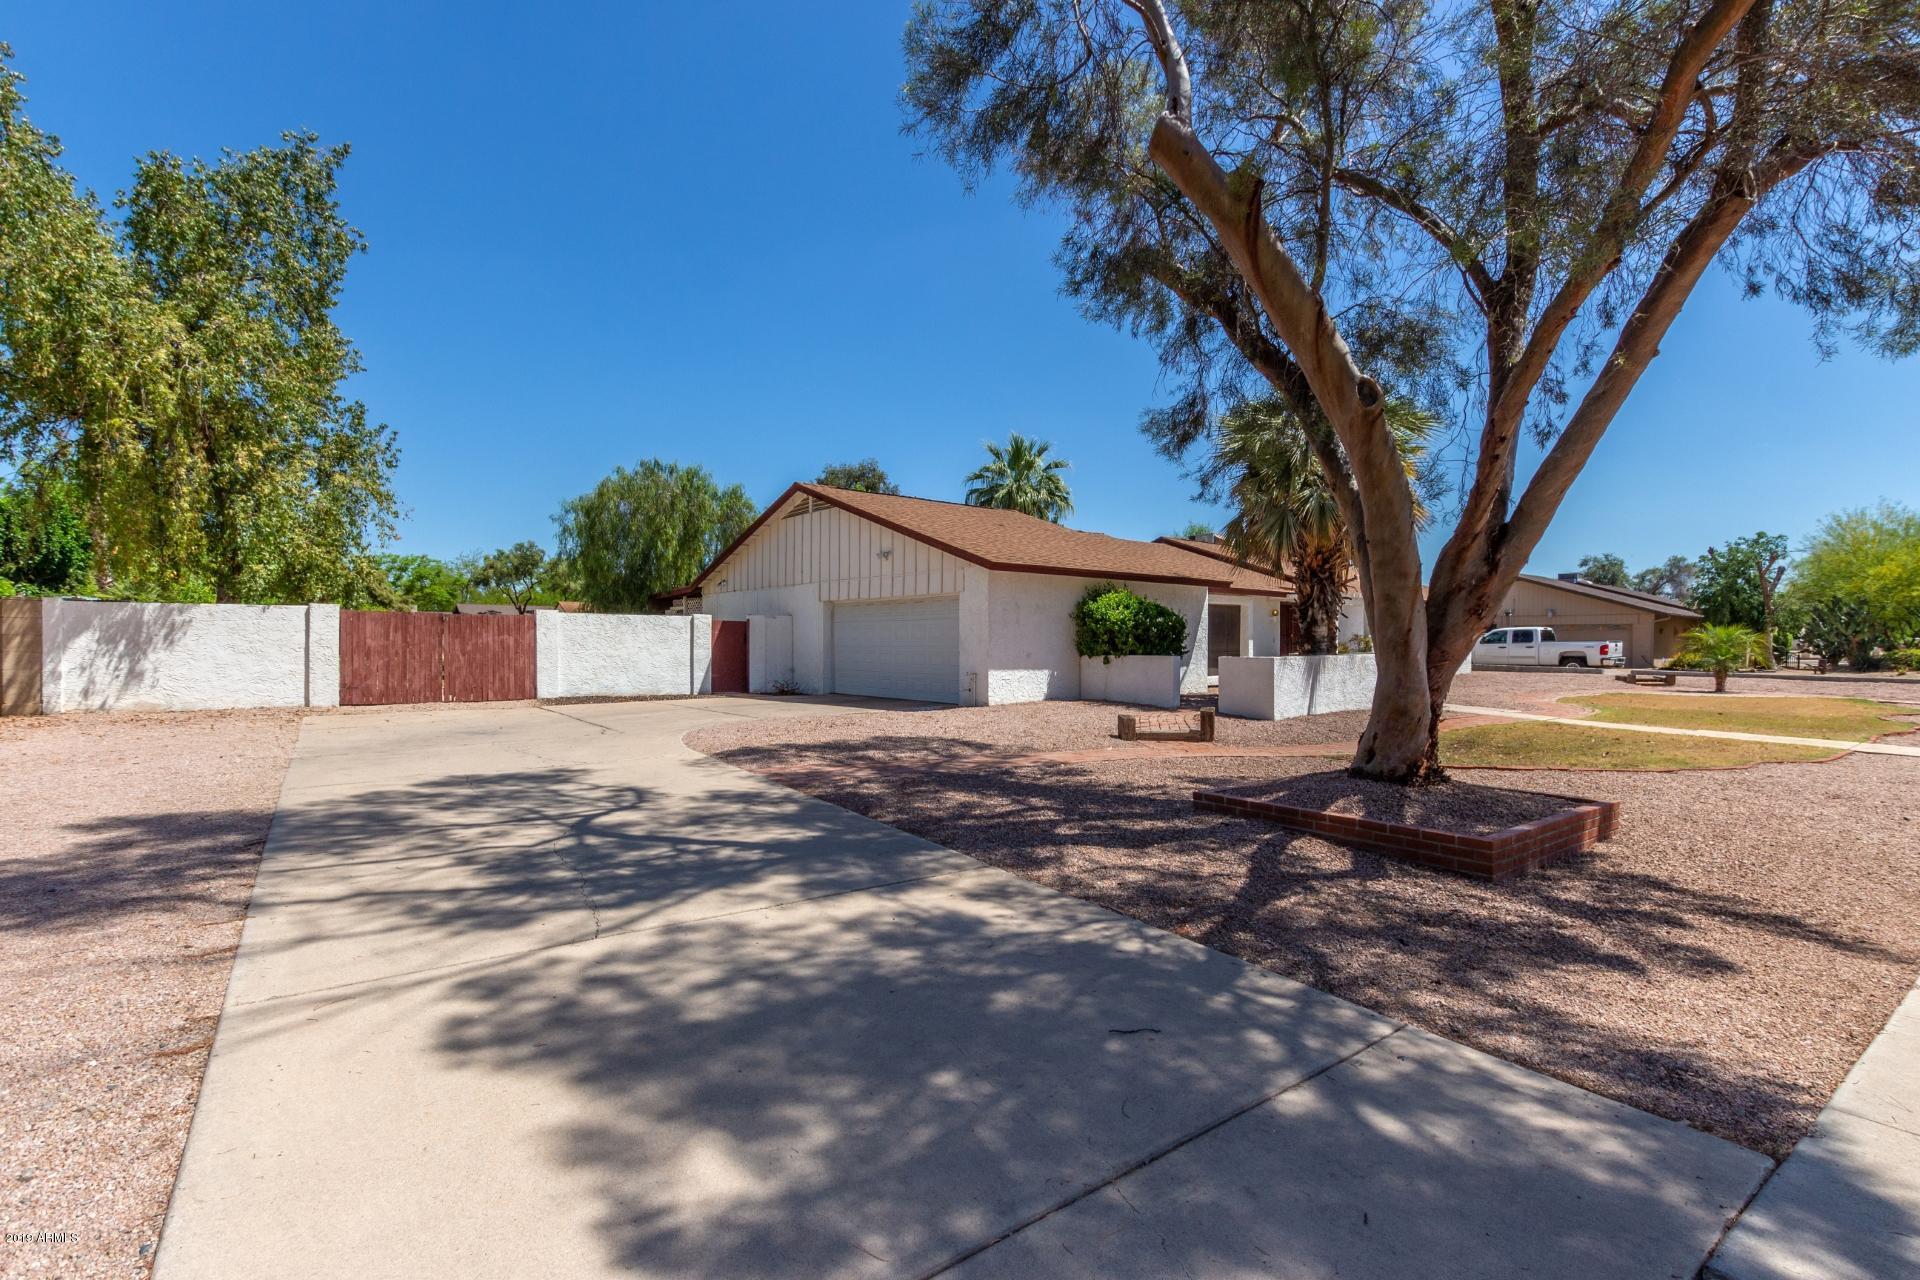 Photo of 5716 W POINSETTIA Drive, Glendale, AZ 85304